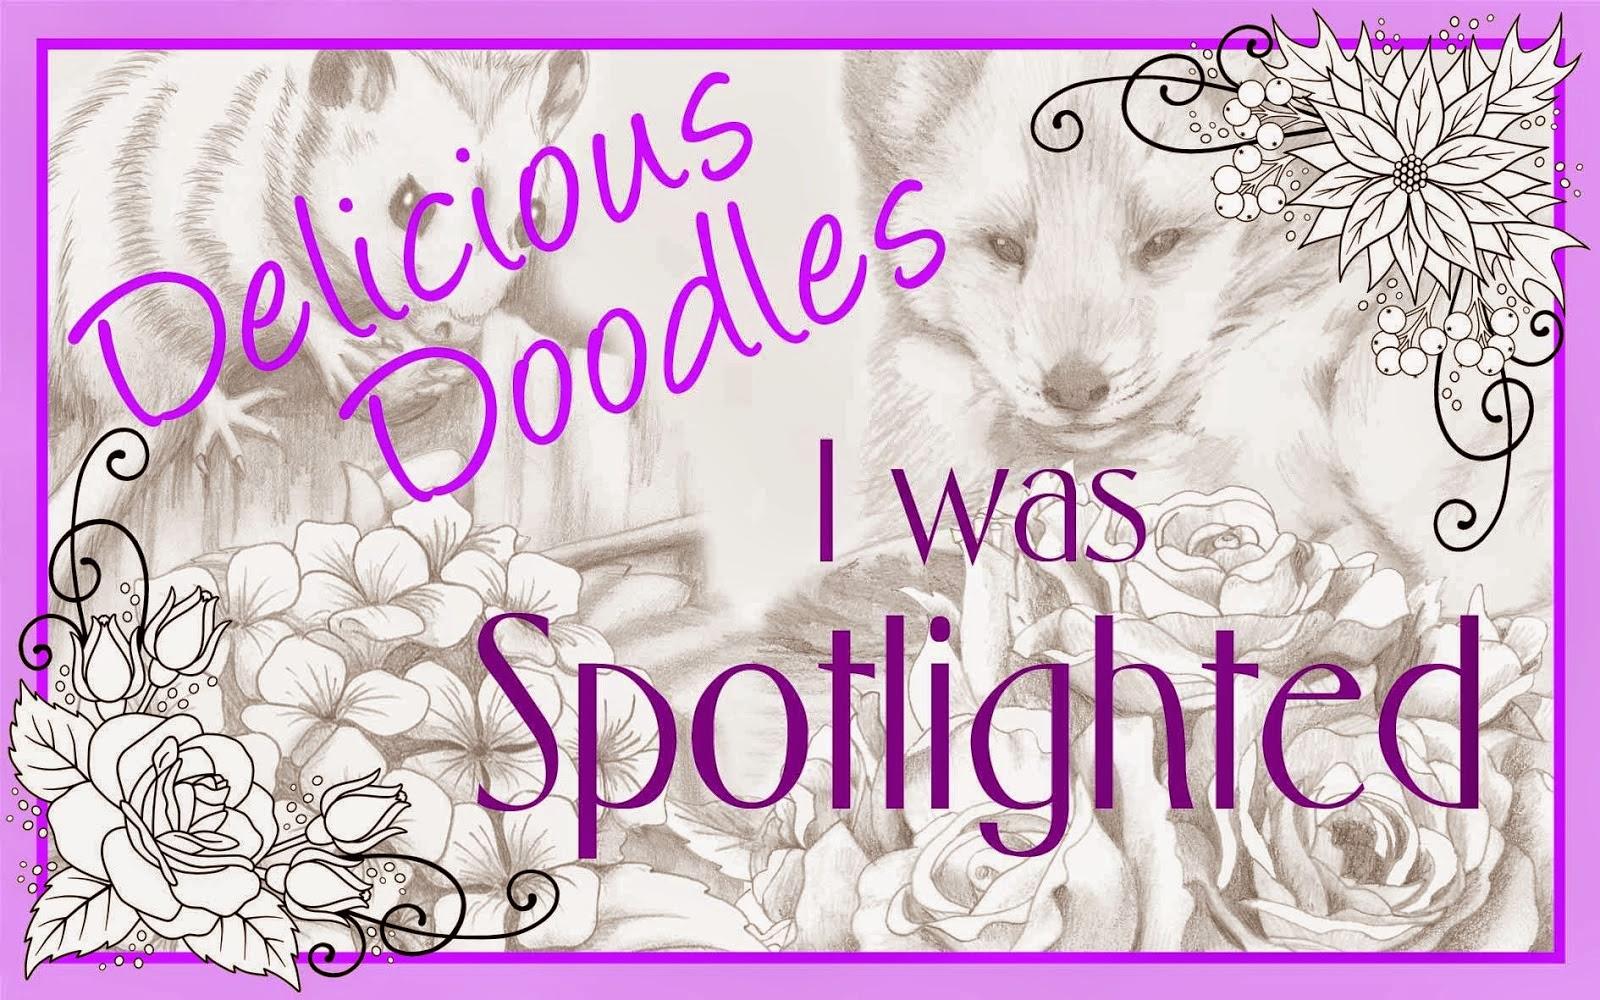 http://deliciousdoodleschallenge.blogspot.co.uk/2014/01/winner-and-spotlight-on-you_10.html